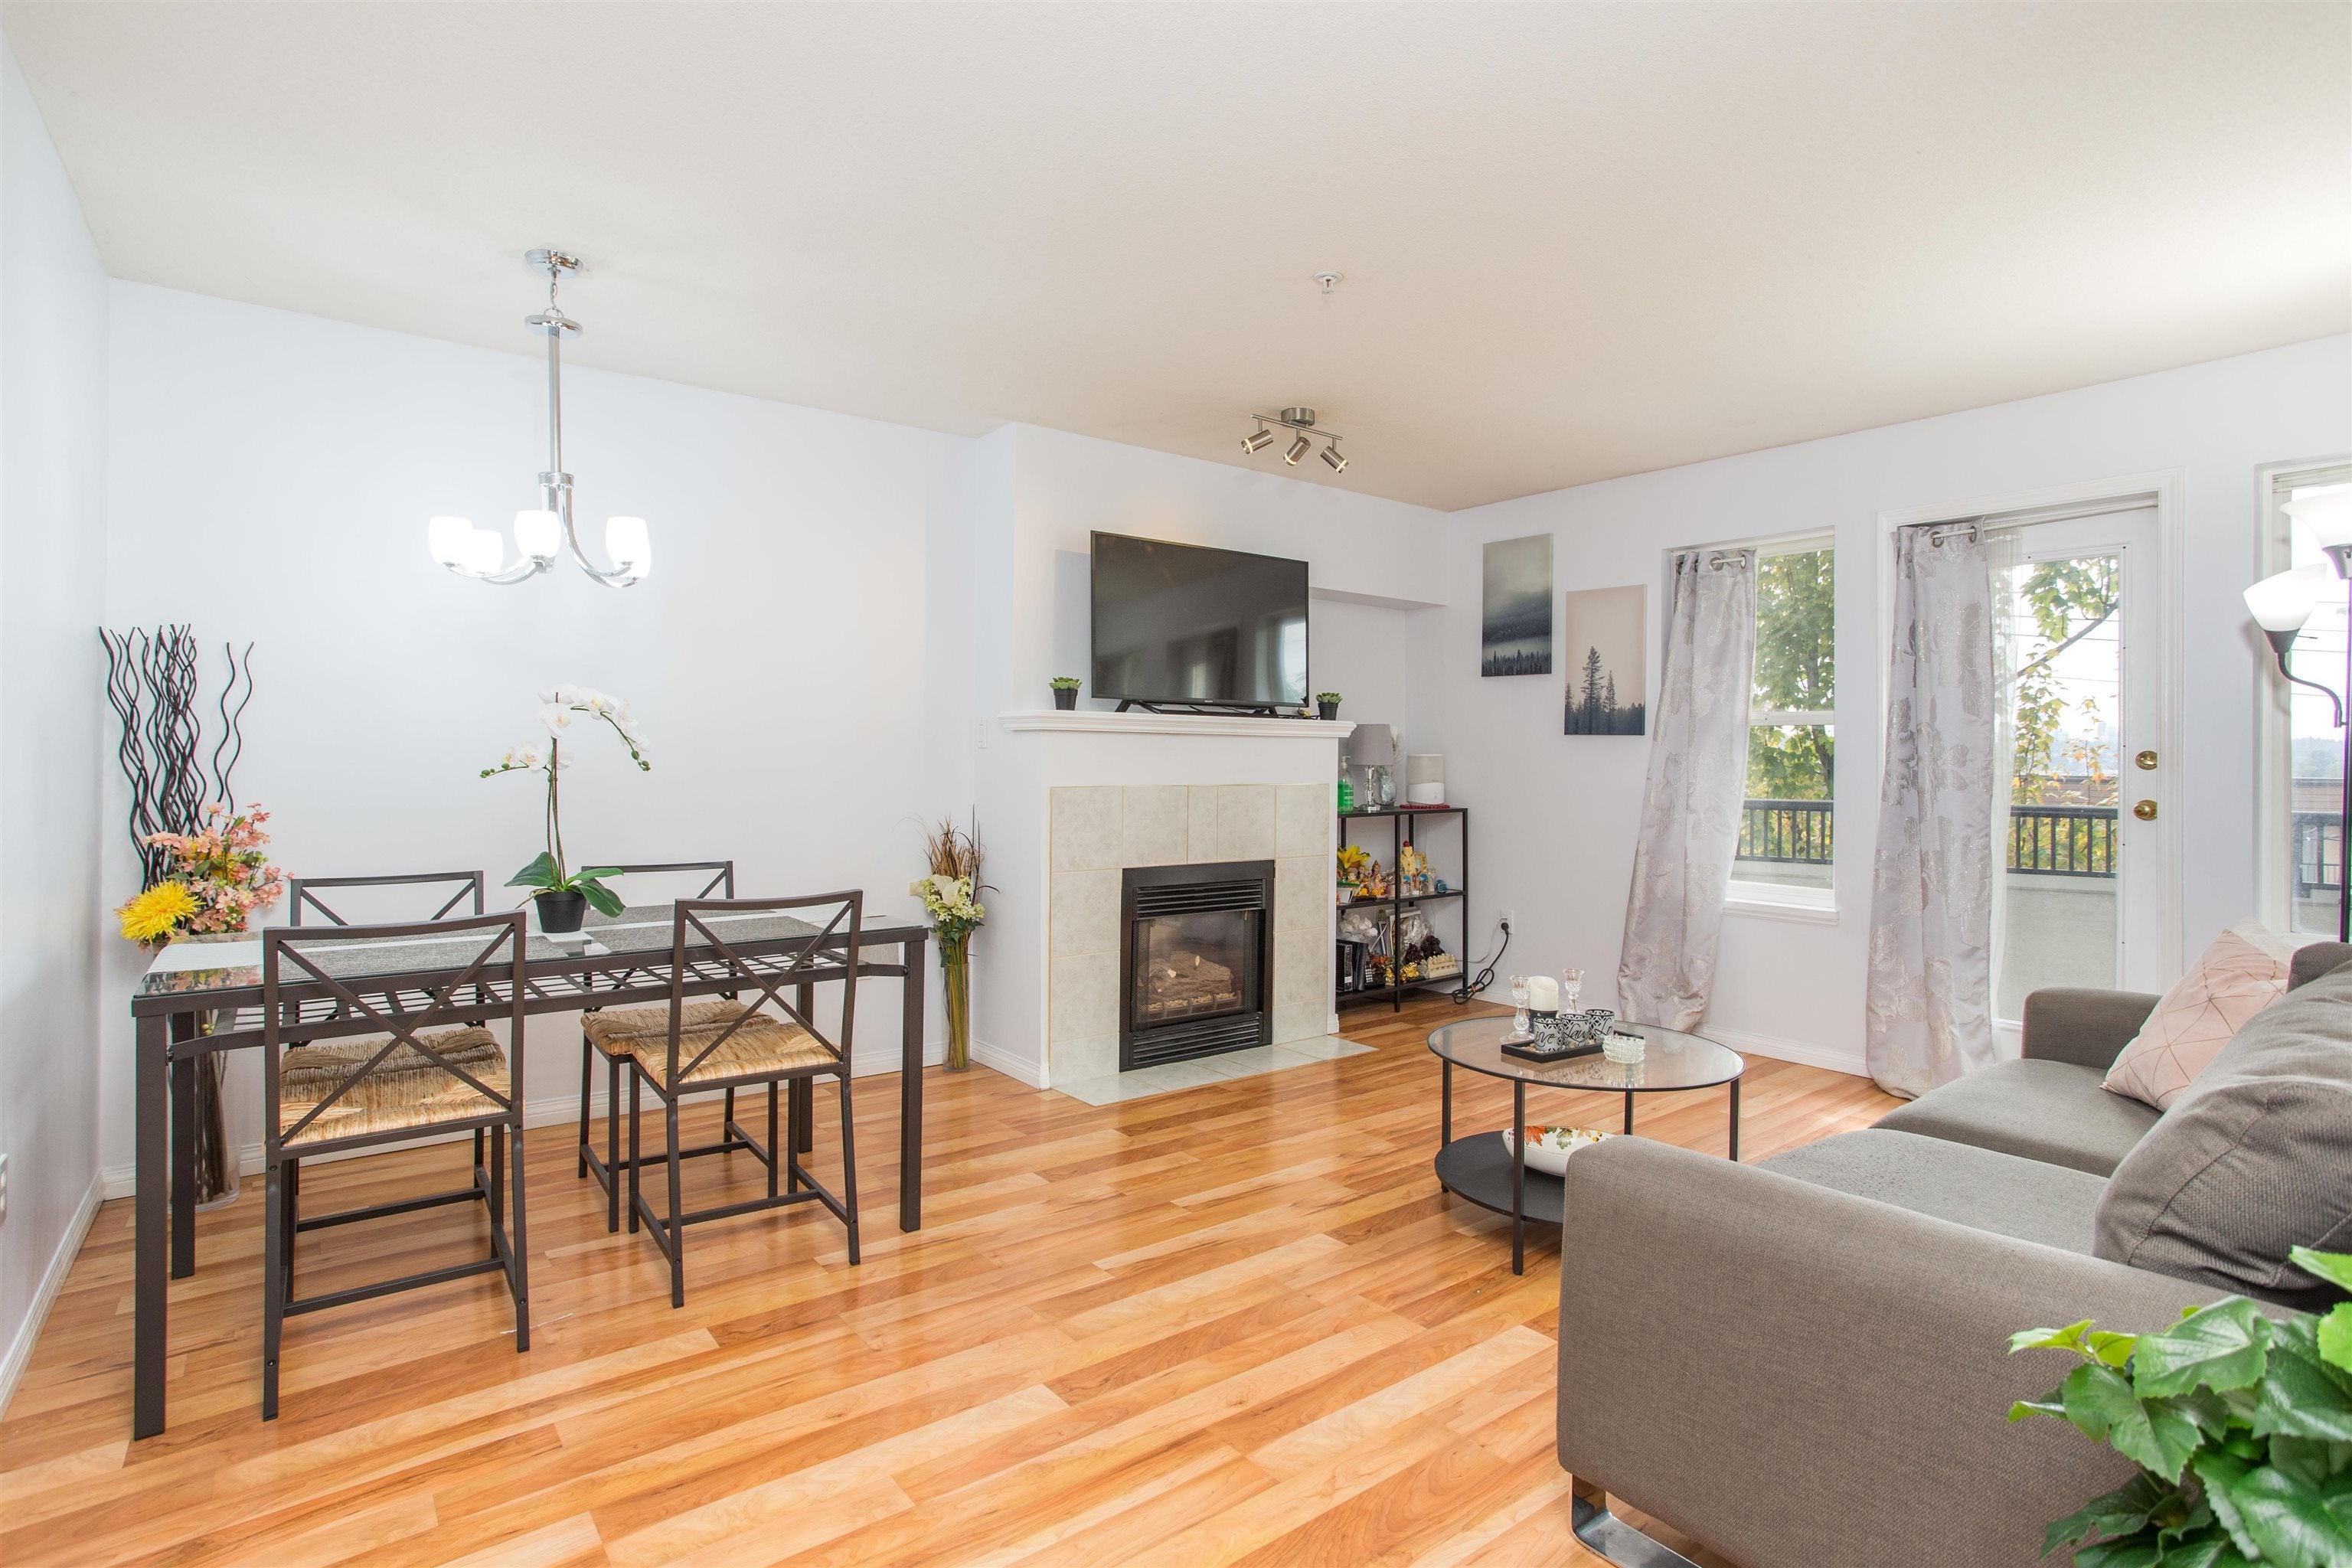 7 205 LEBLEU STREET - Maillardville Apartment/Condo for sale, 3 Bedrooms (R2625671) - #2